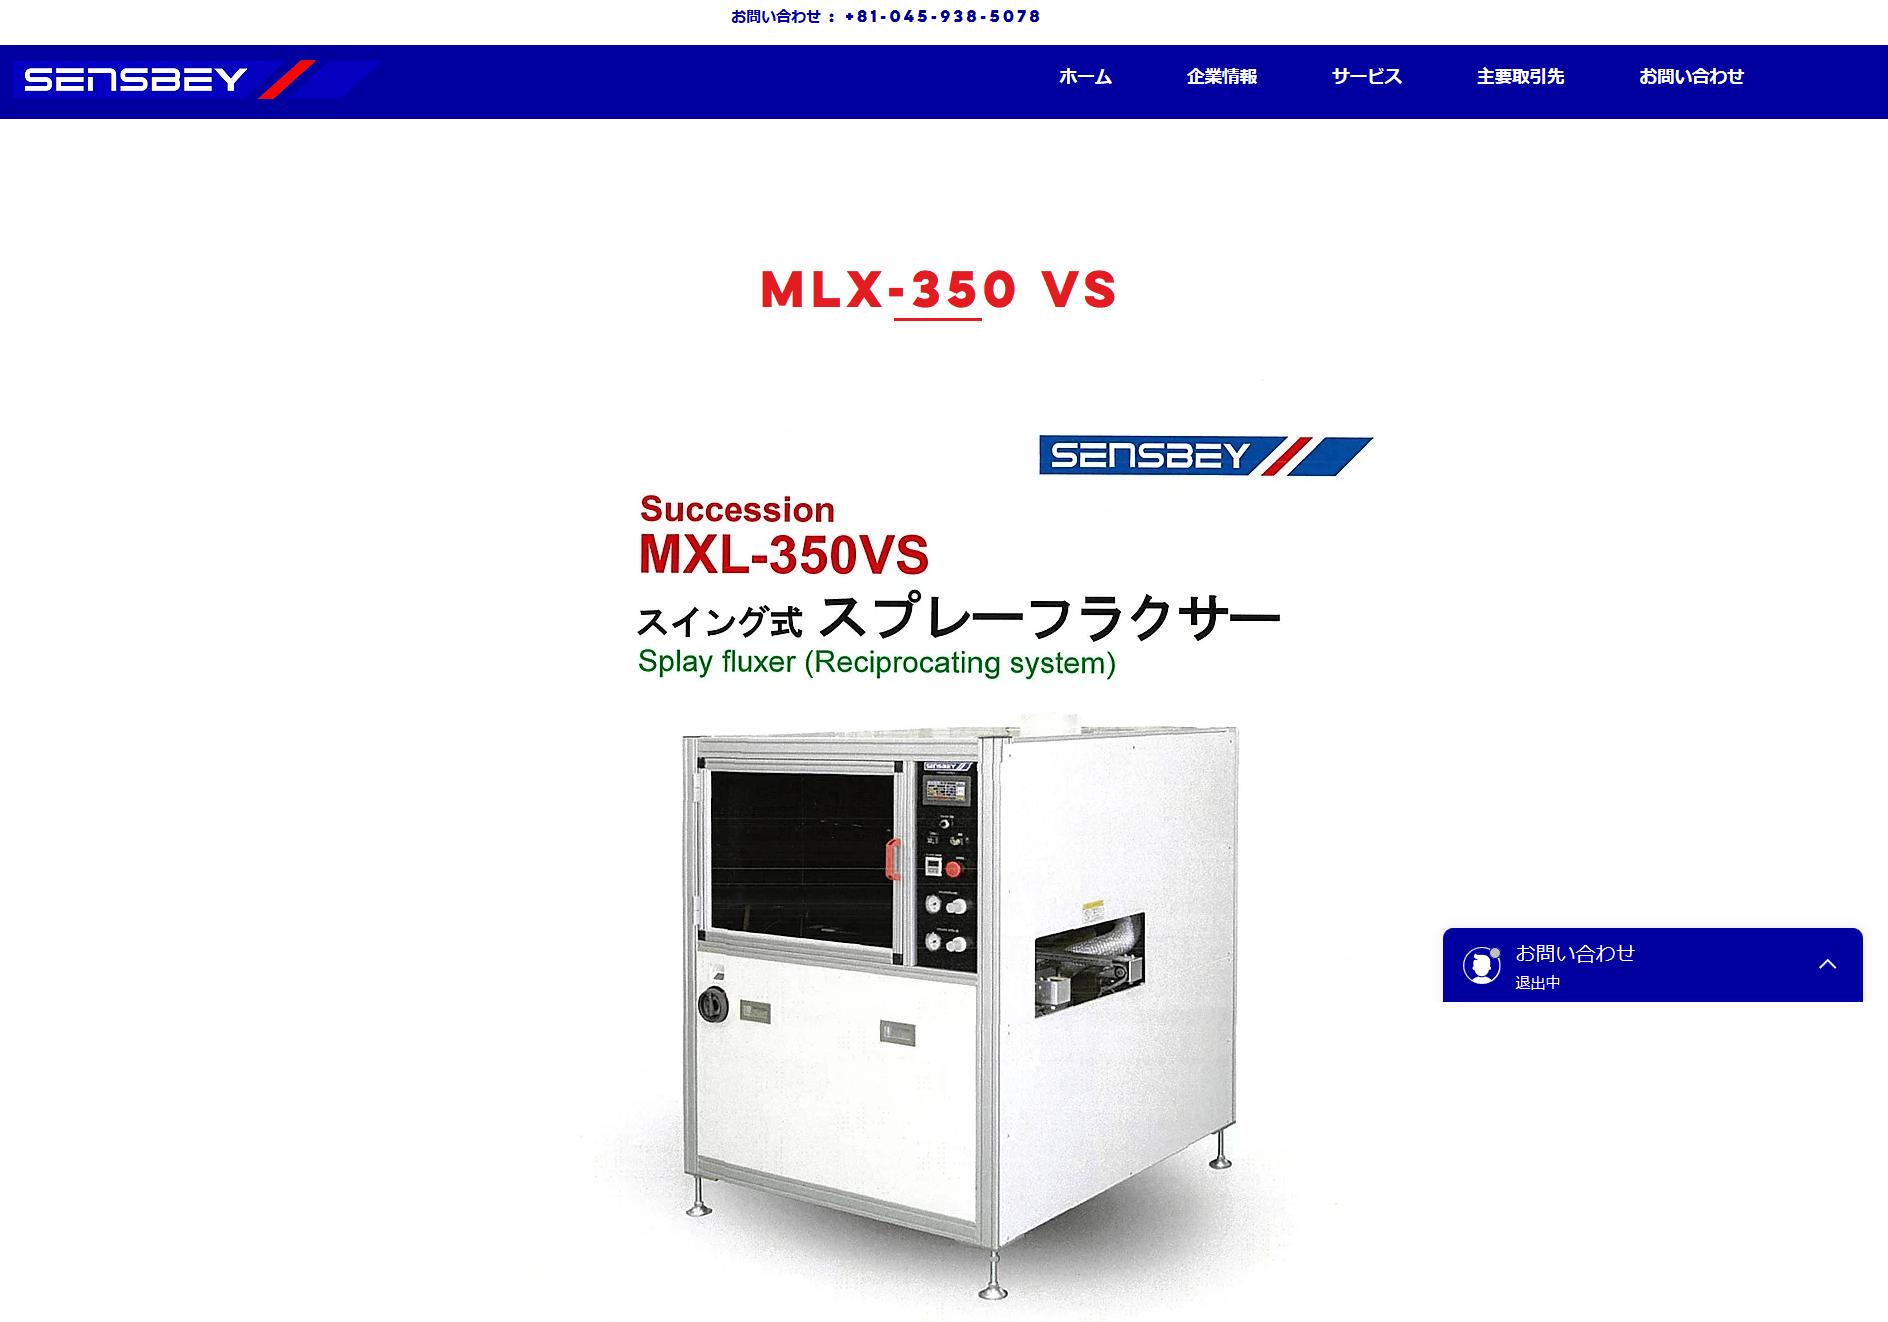 MLX-350 VS